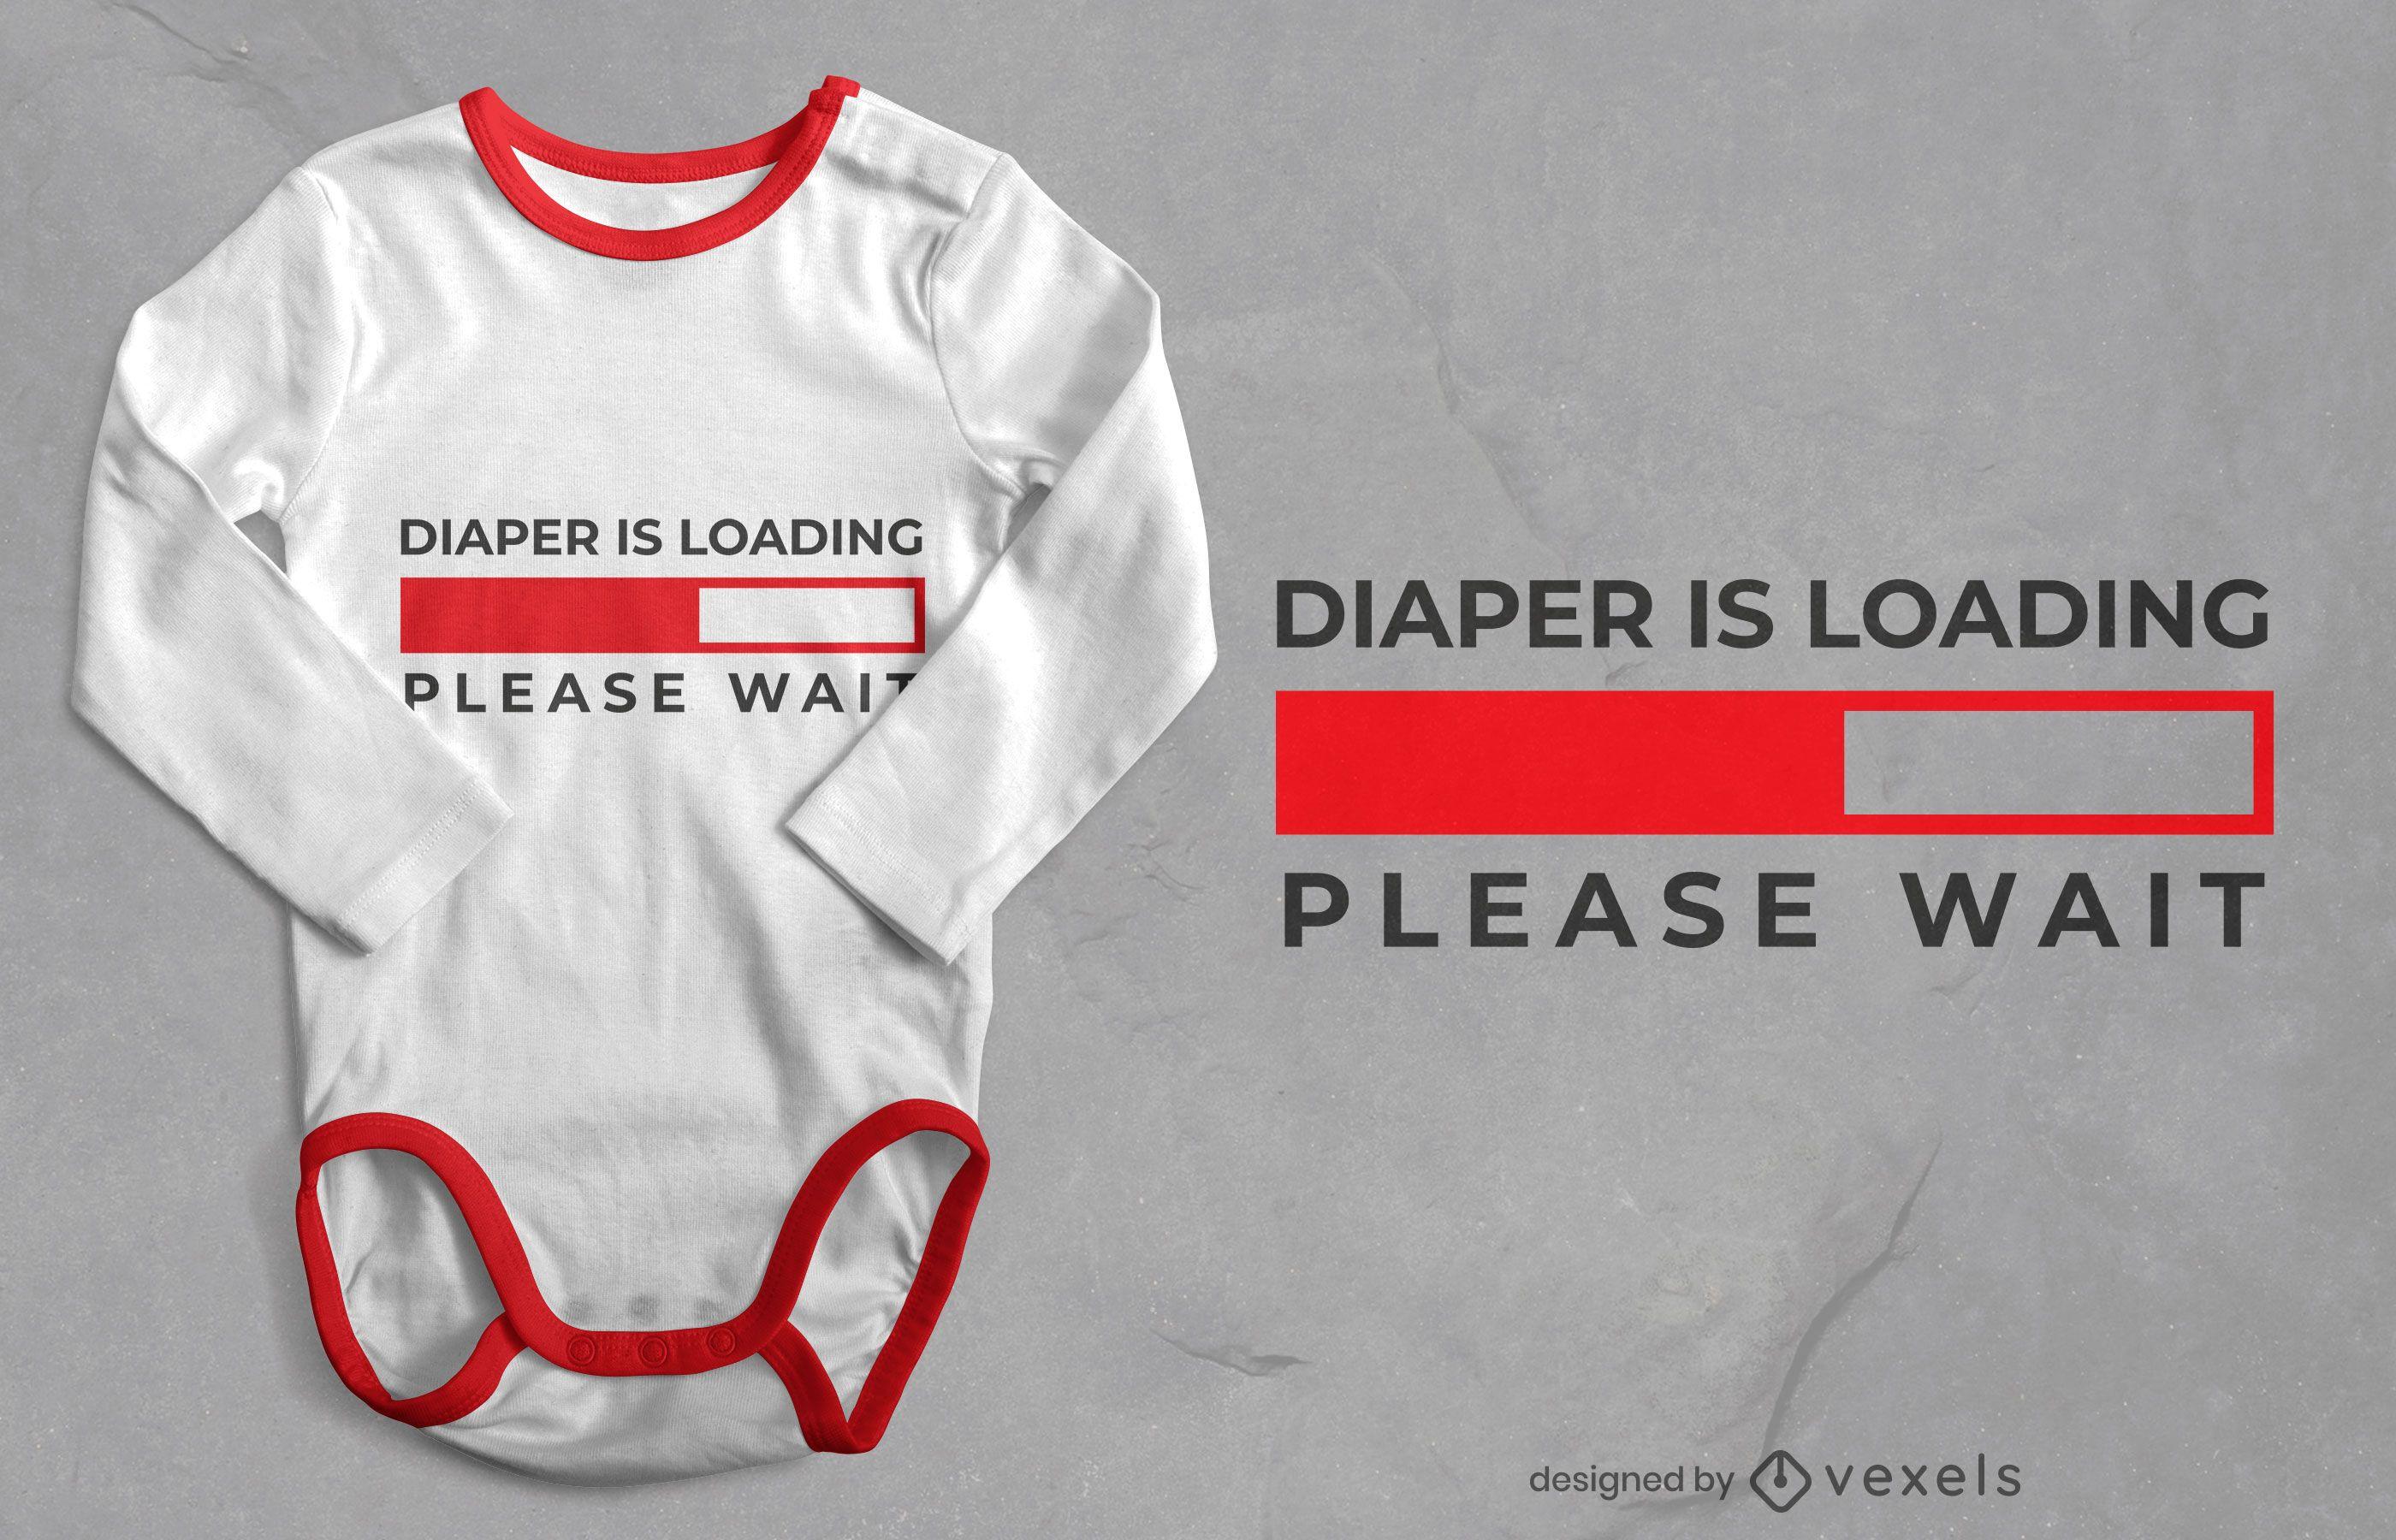 Diseño de camiseta con cita de barra de carga de pañales